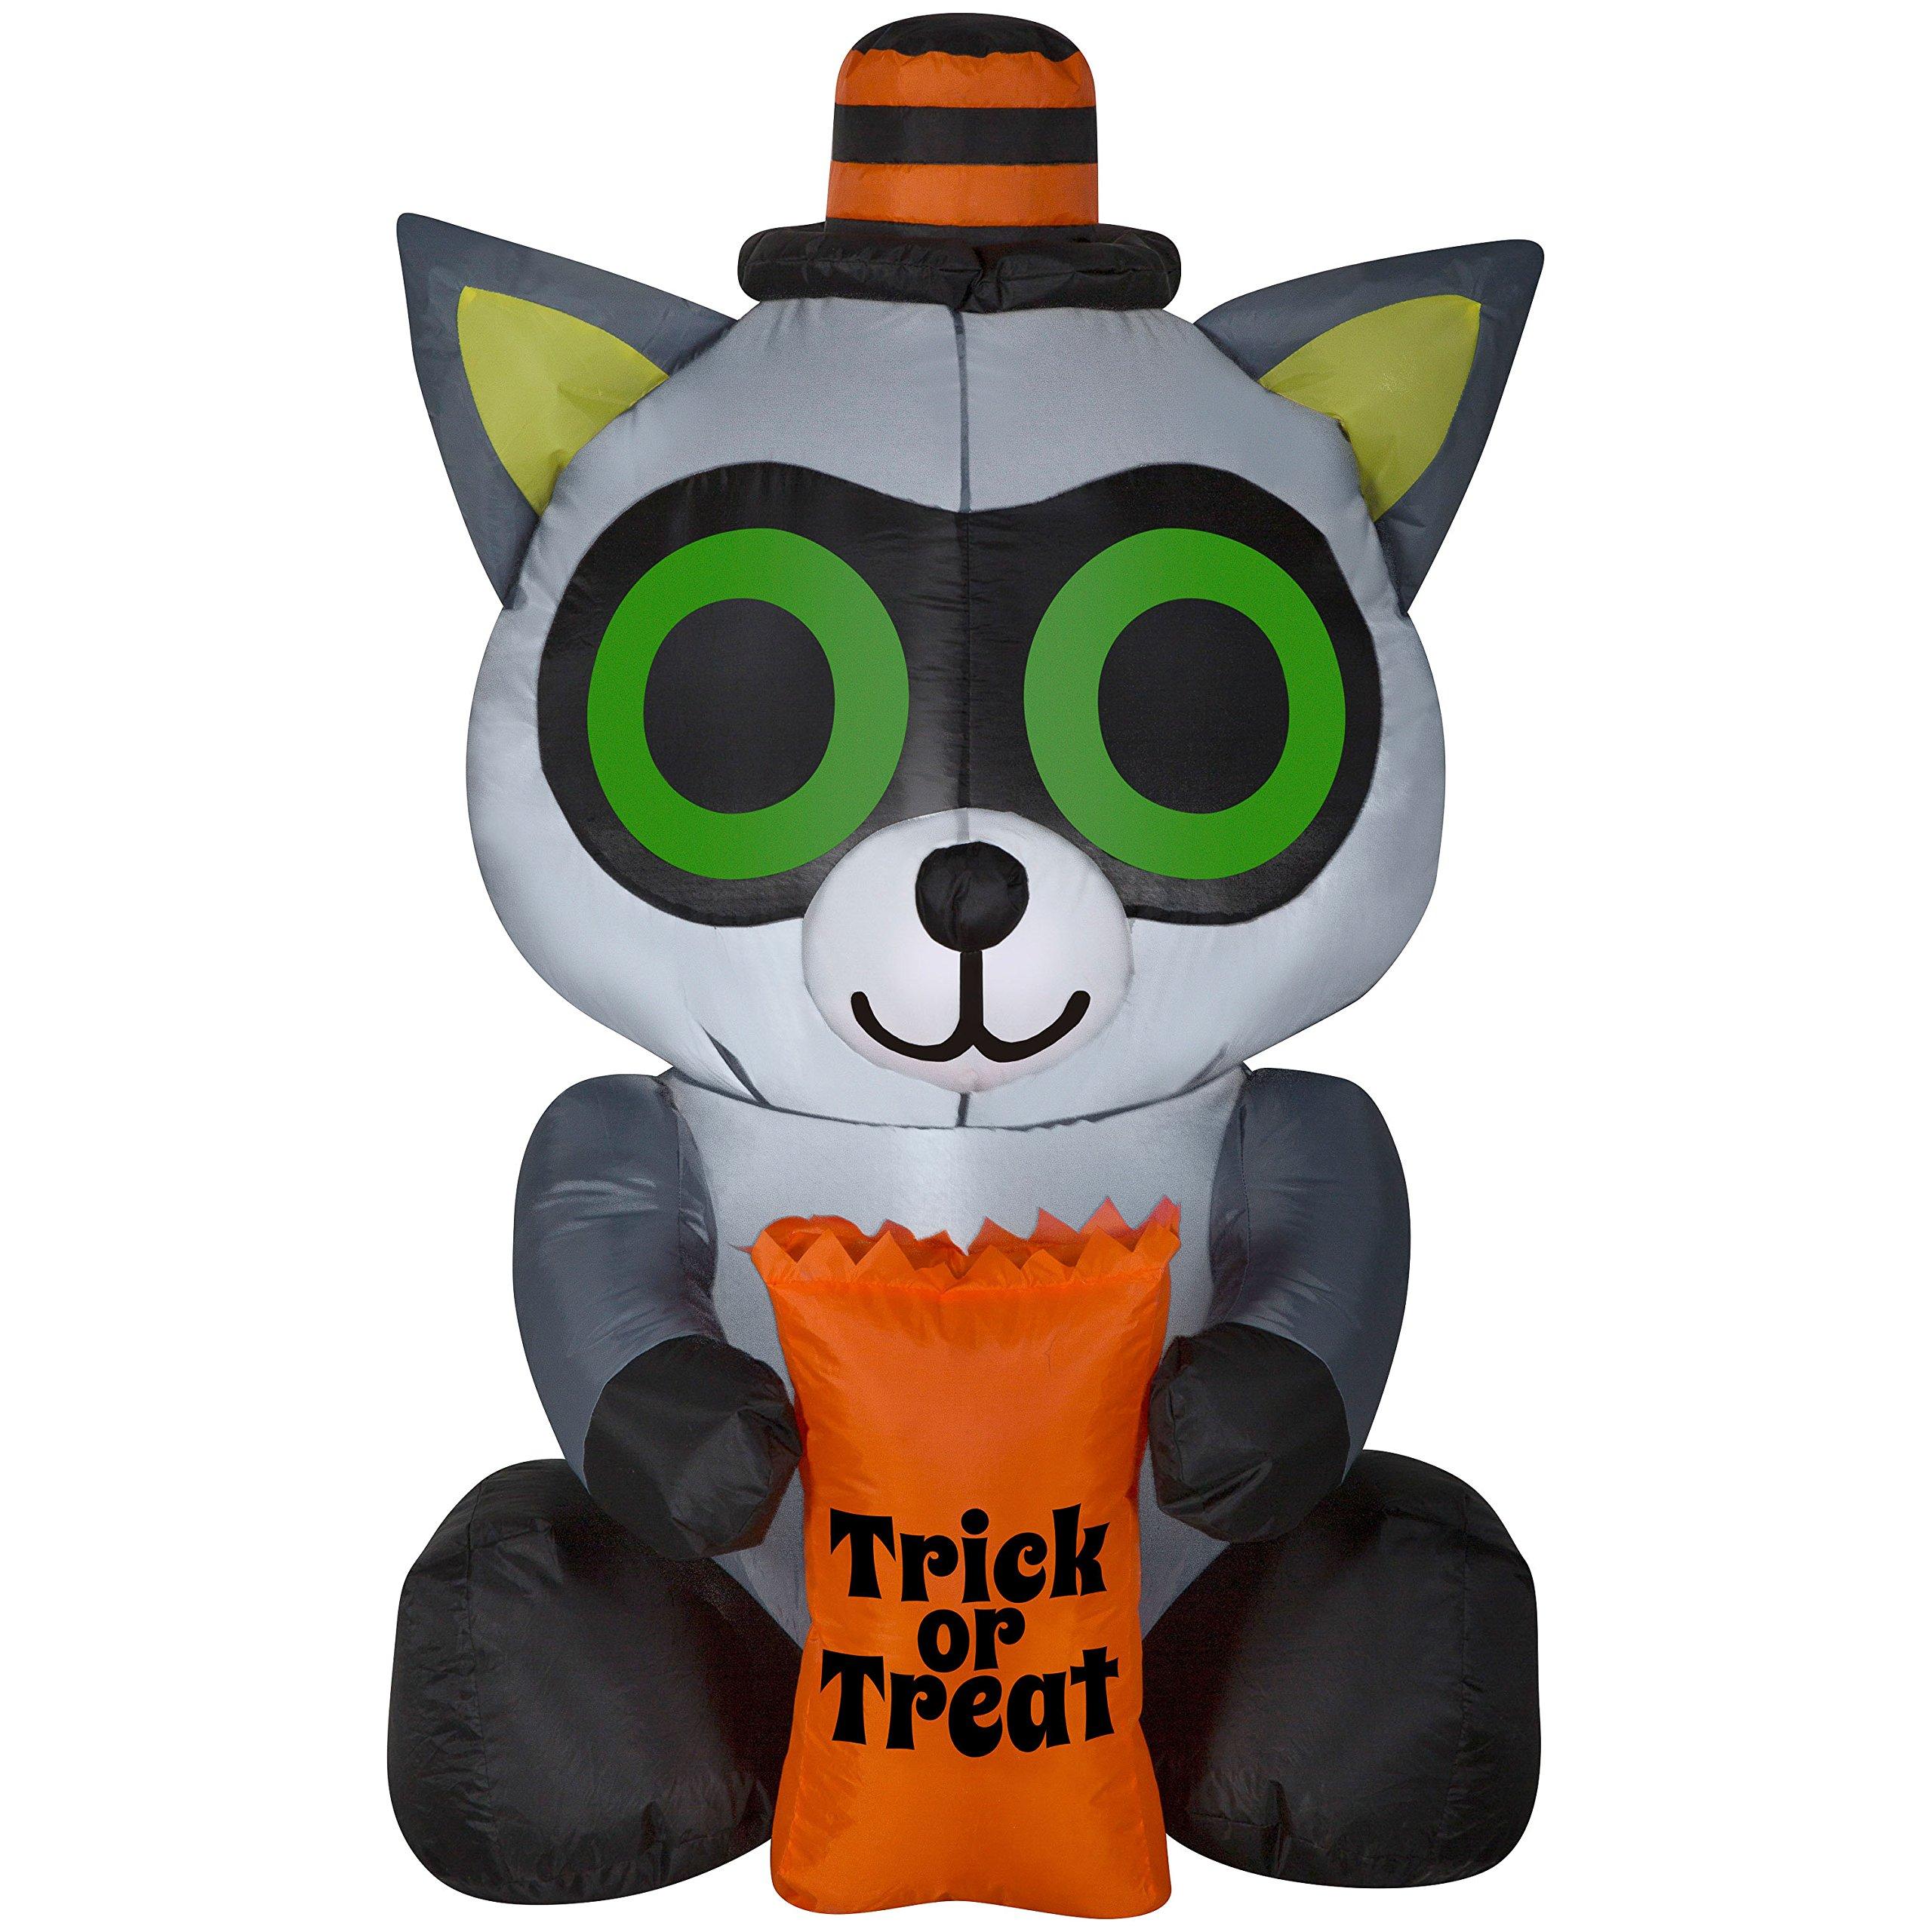 Halloween Inflatable Decorations Yard Outdoor Lights Up Kids Fun Trick o Treat Raccoon